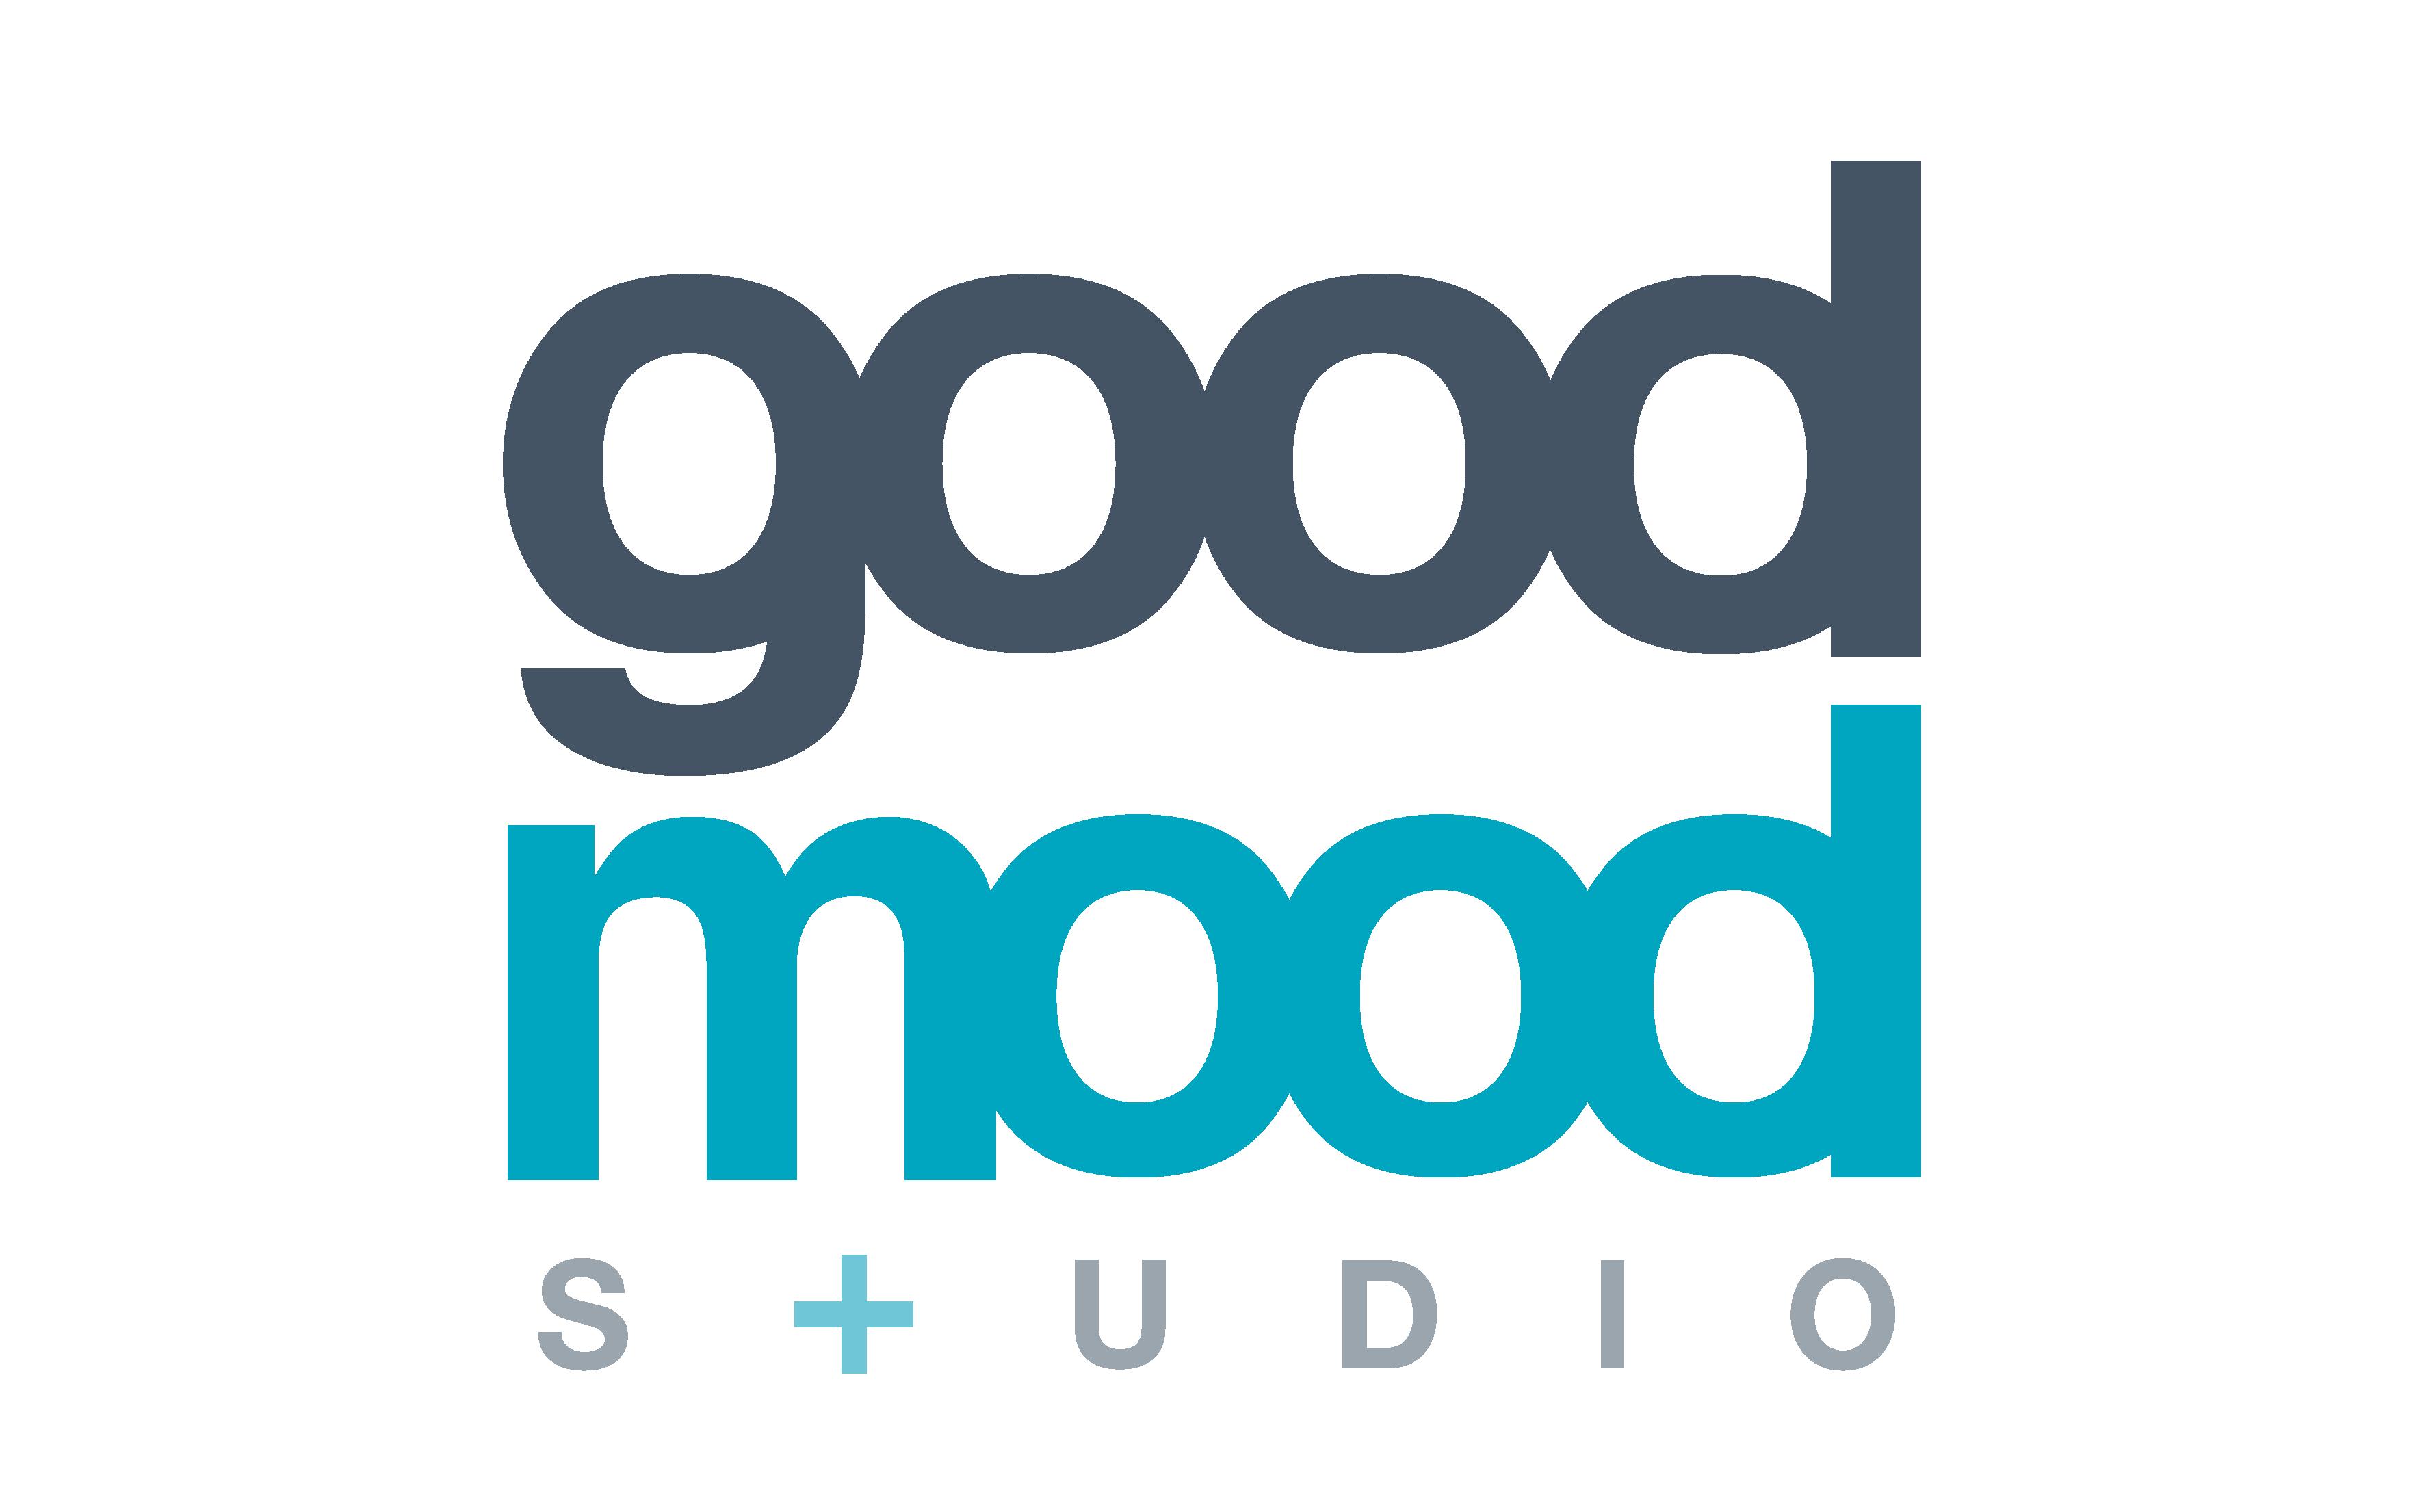 Good Mood Studio - Kreatywne studio mebli kuchennych